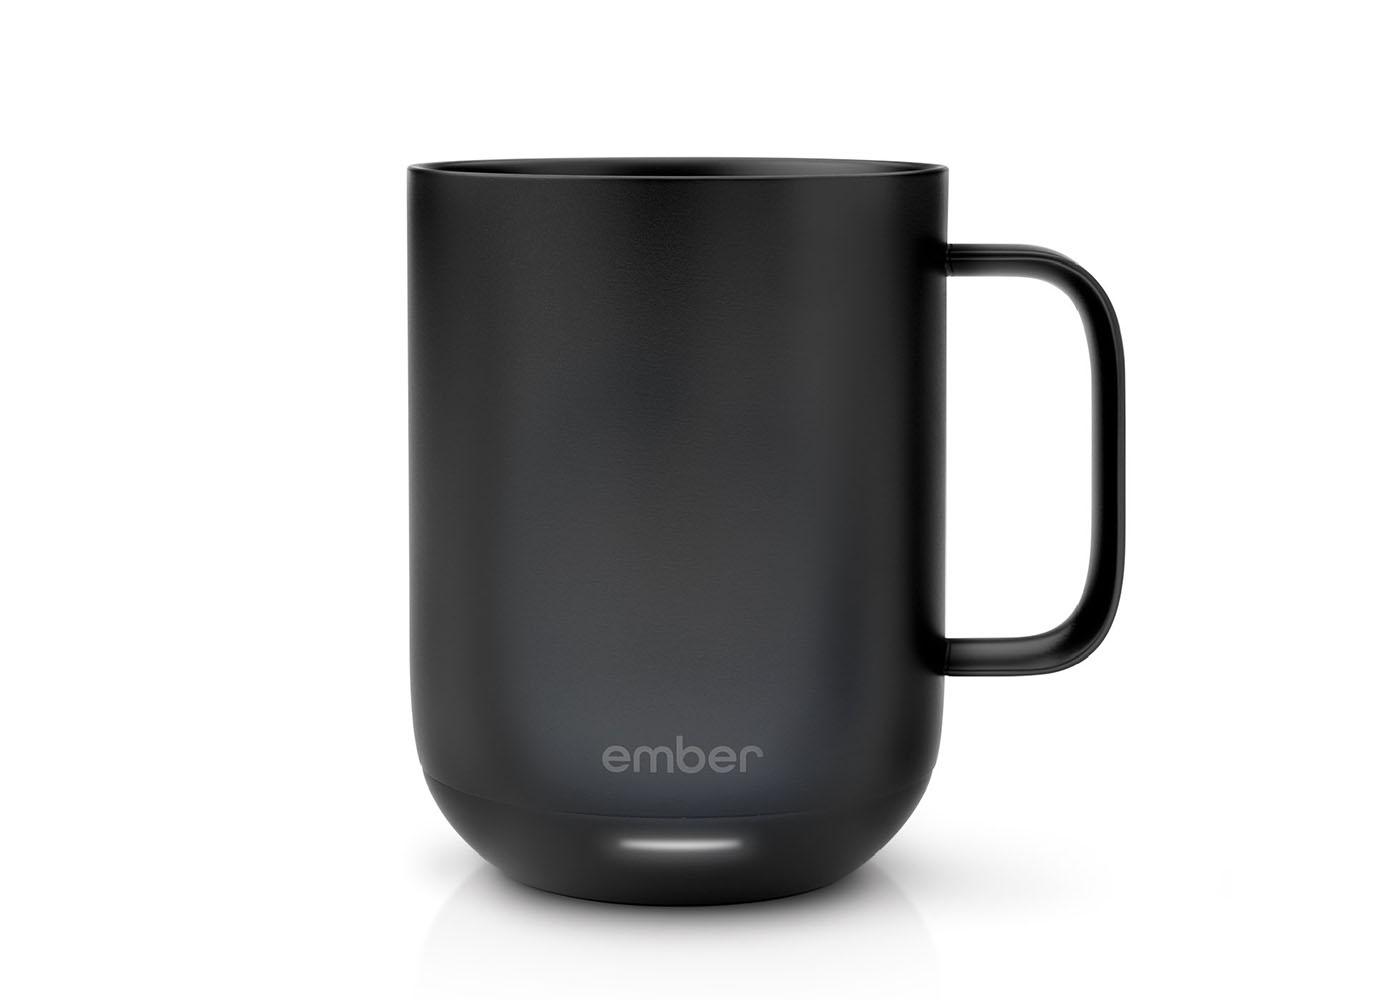 Ember Smart Mug